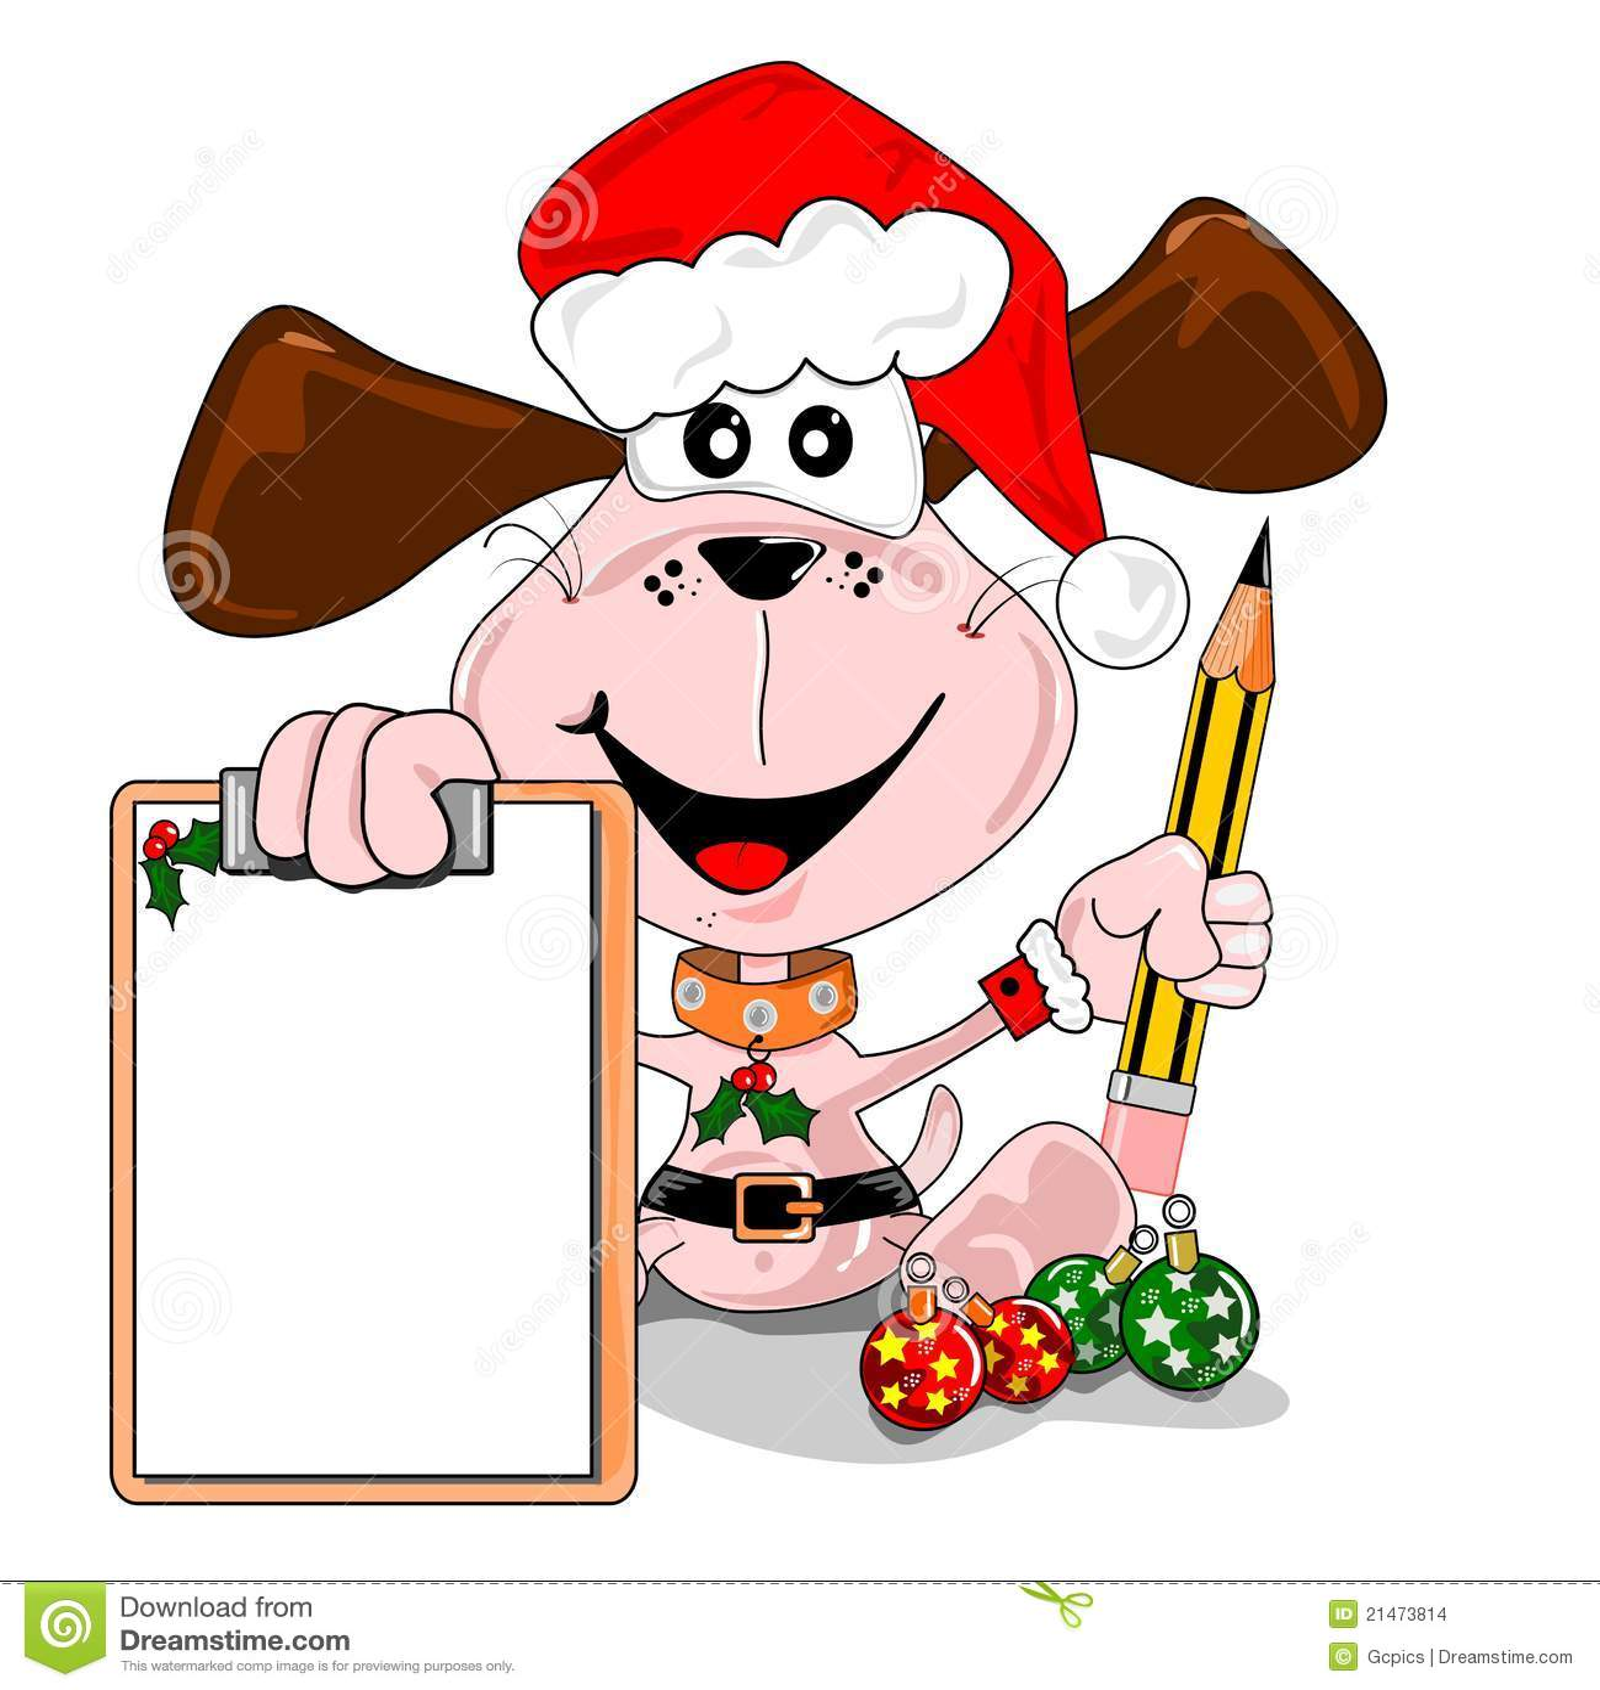 christmas wish list stock images image 21473814. Black Bedroom Furniture Sets. Home Design Ideas